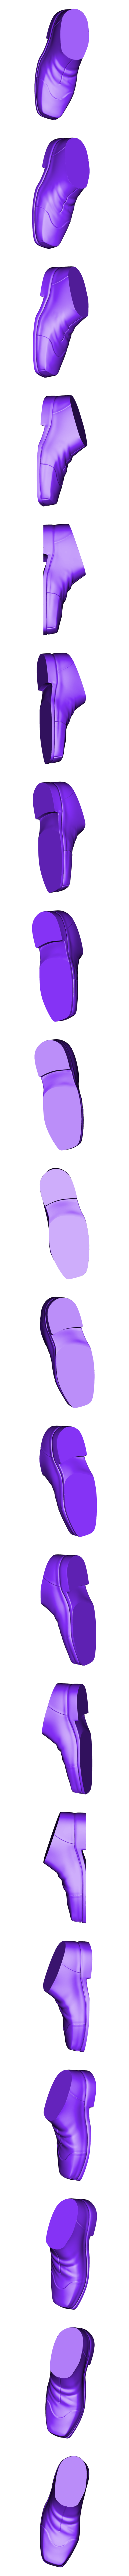 Shoe_right.stl Download free STL file Bold Machines: Mr. Walthersnap • 3D print design, boldmachines